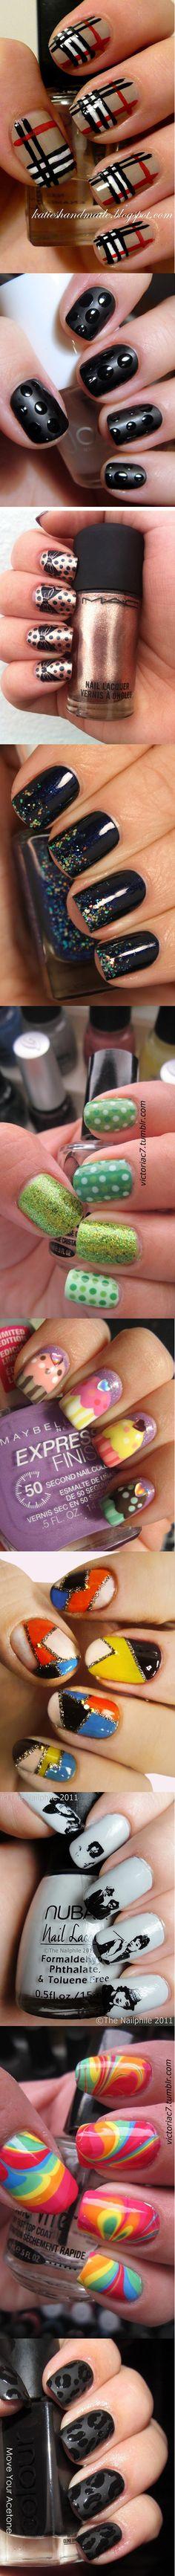 My 10 favorite #nail designs on my nail board...so far :-)